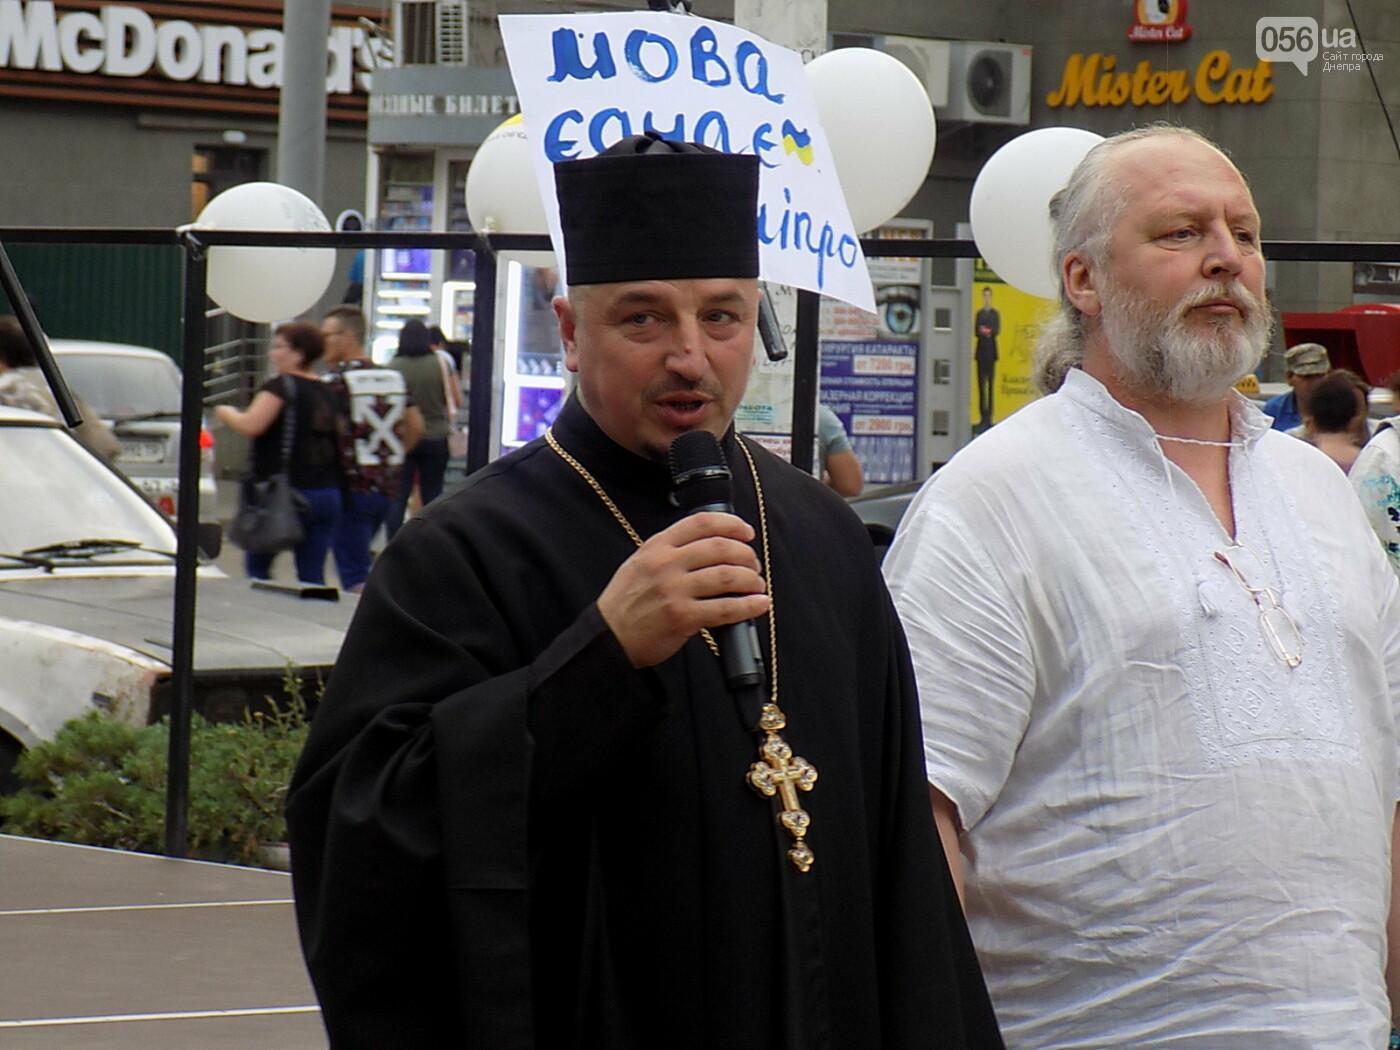 """Мова єднає Дніпро"": в центре города прошла символическая акция с концертом и подарками, - ФОТО, фото-17"